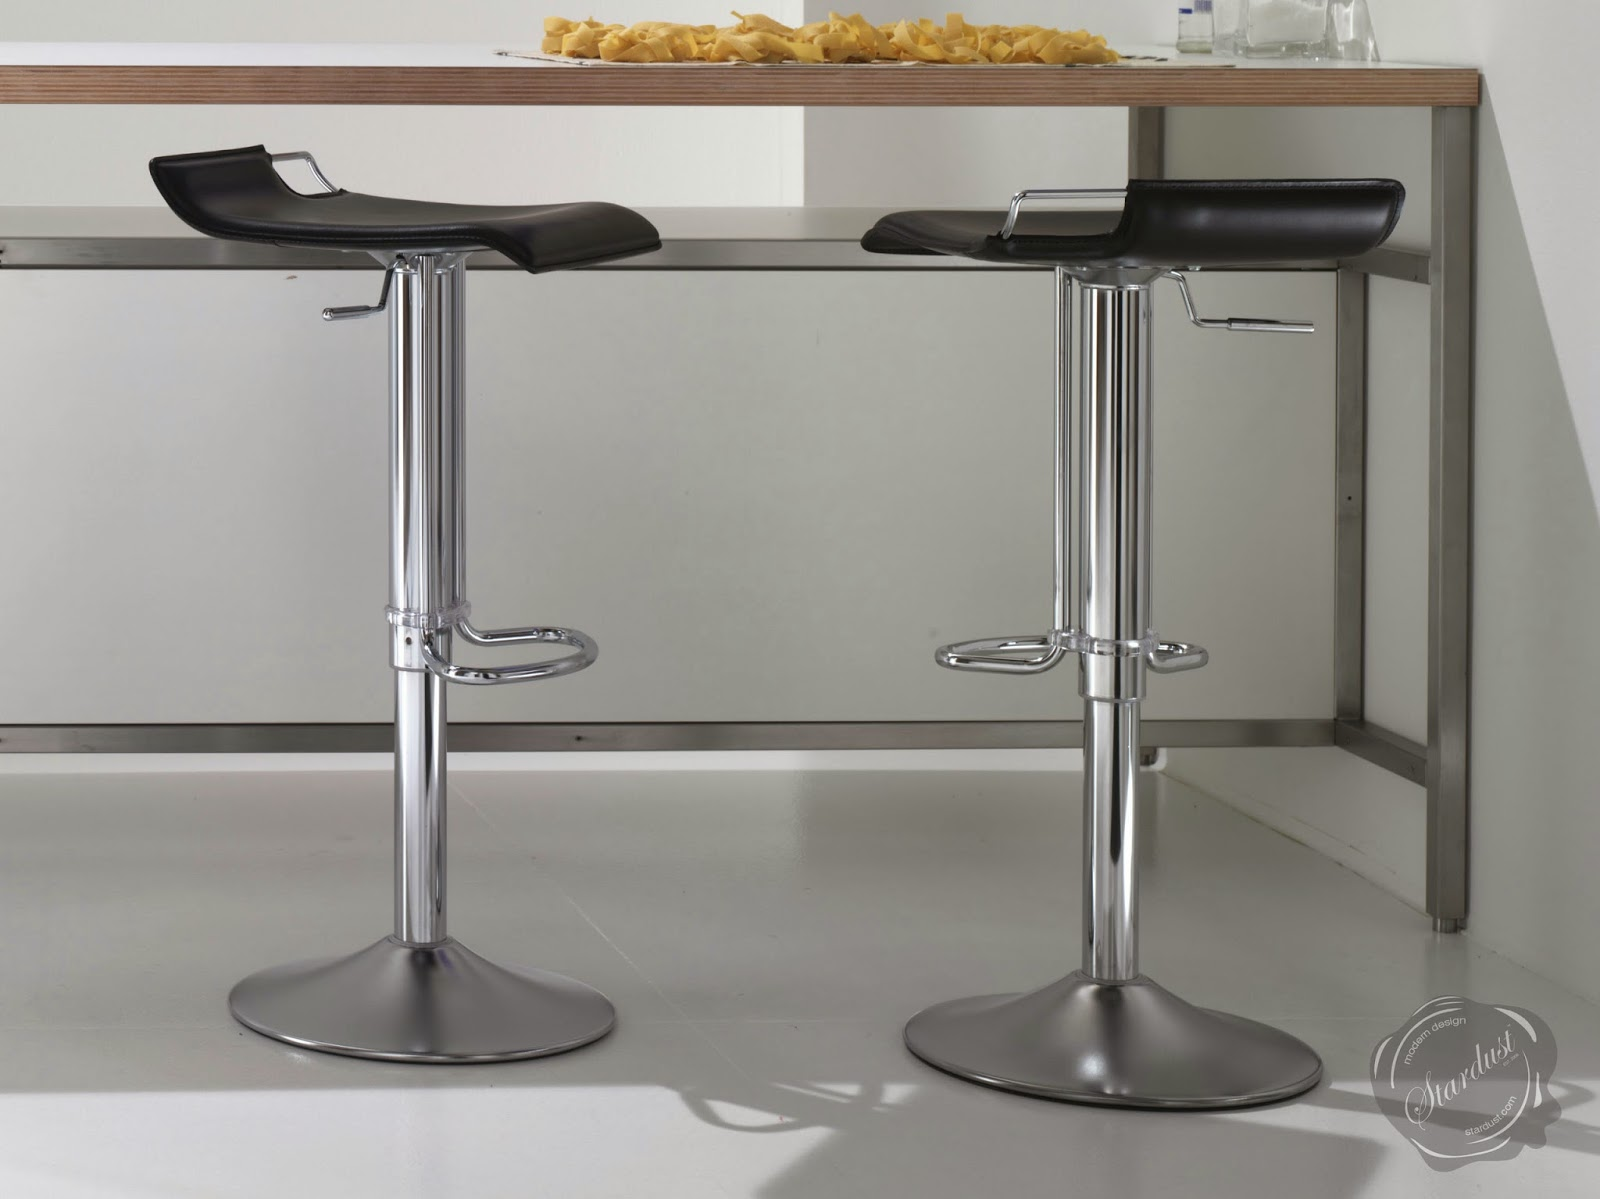 modern kitchen bar stools island with hoppy leather stool adjustable